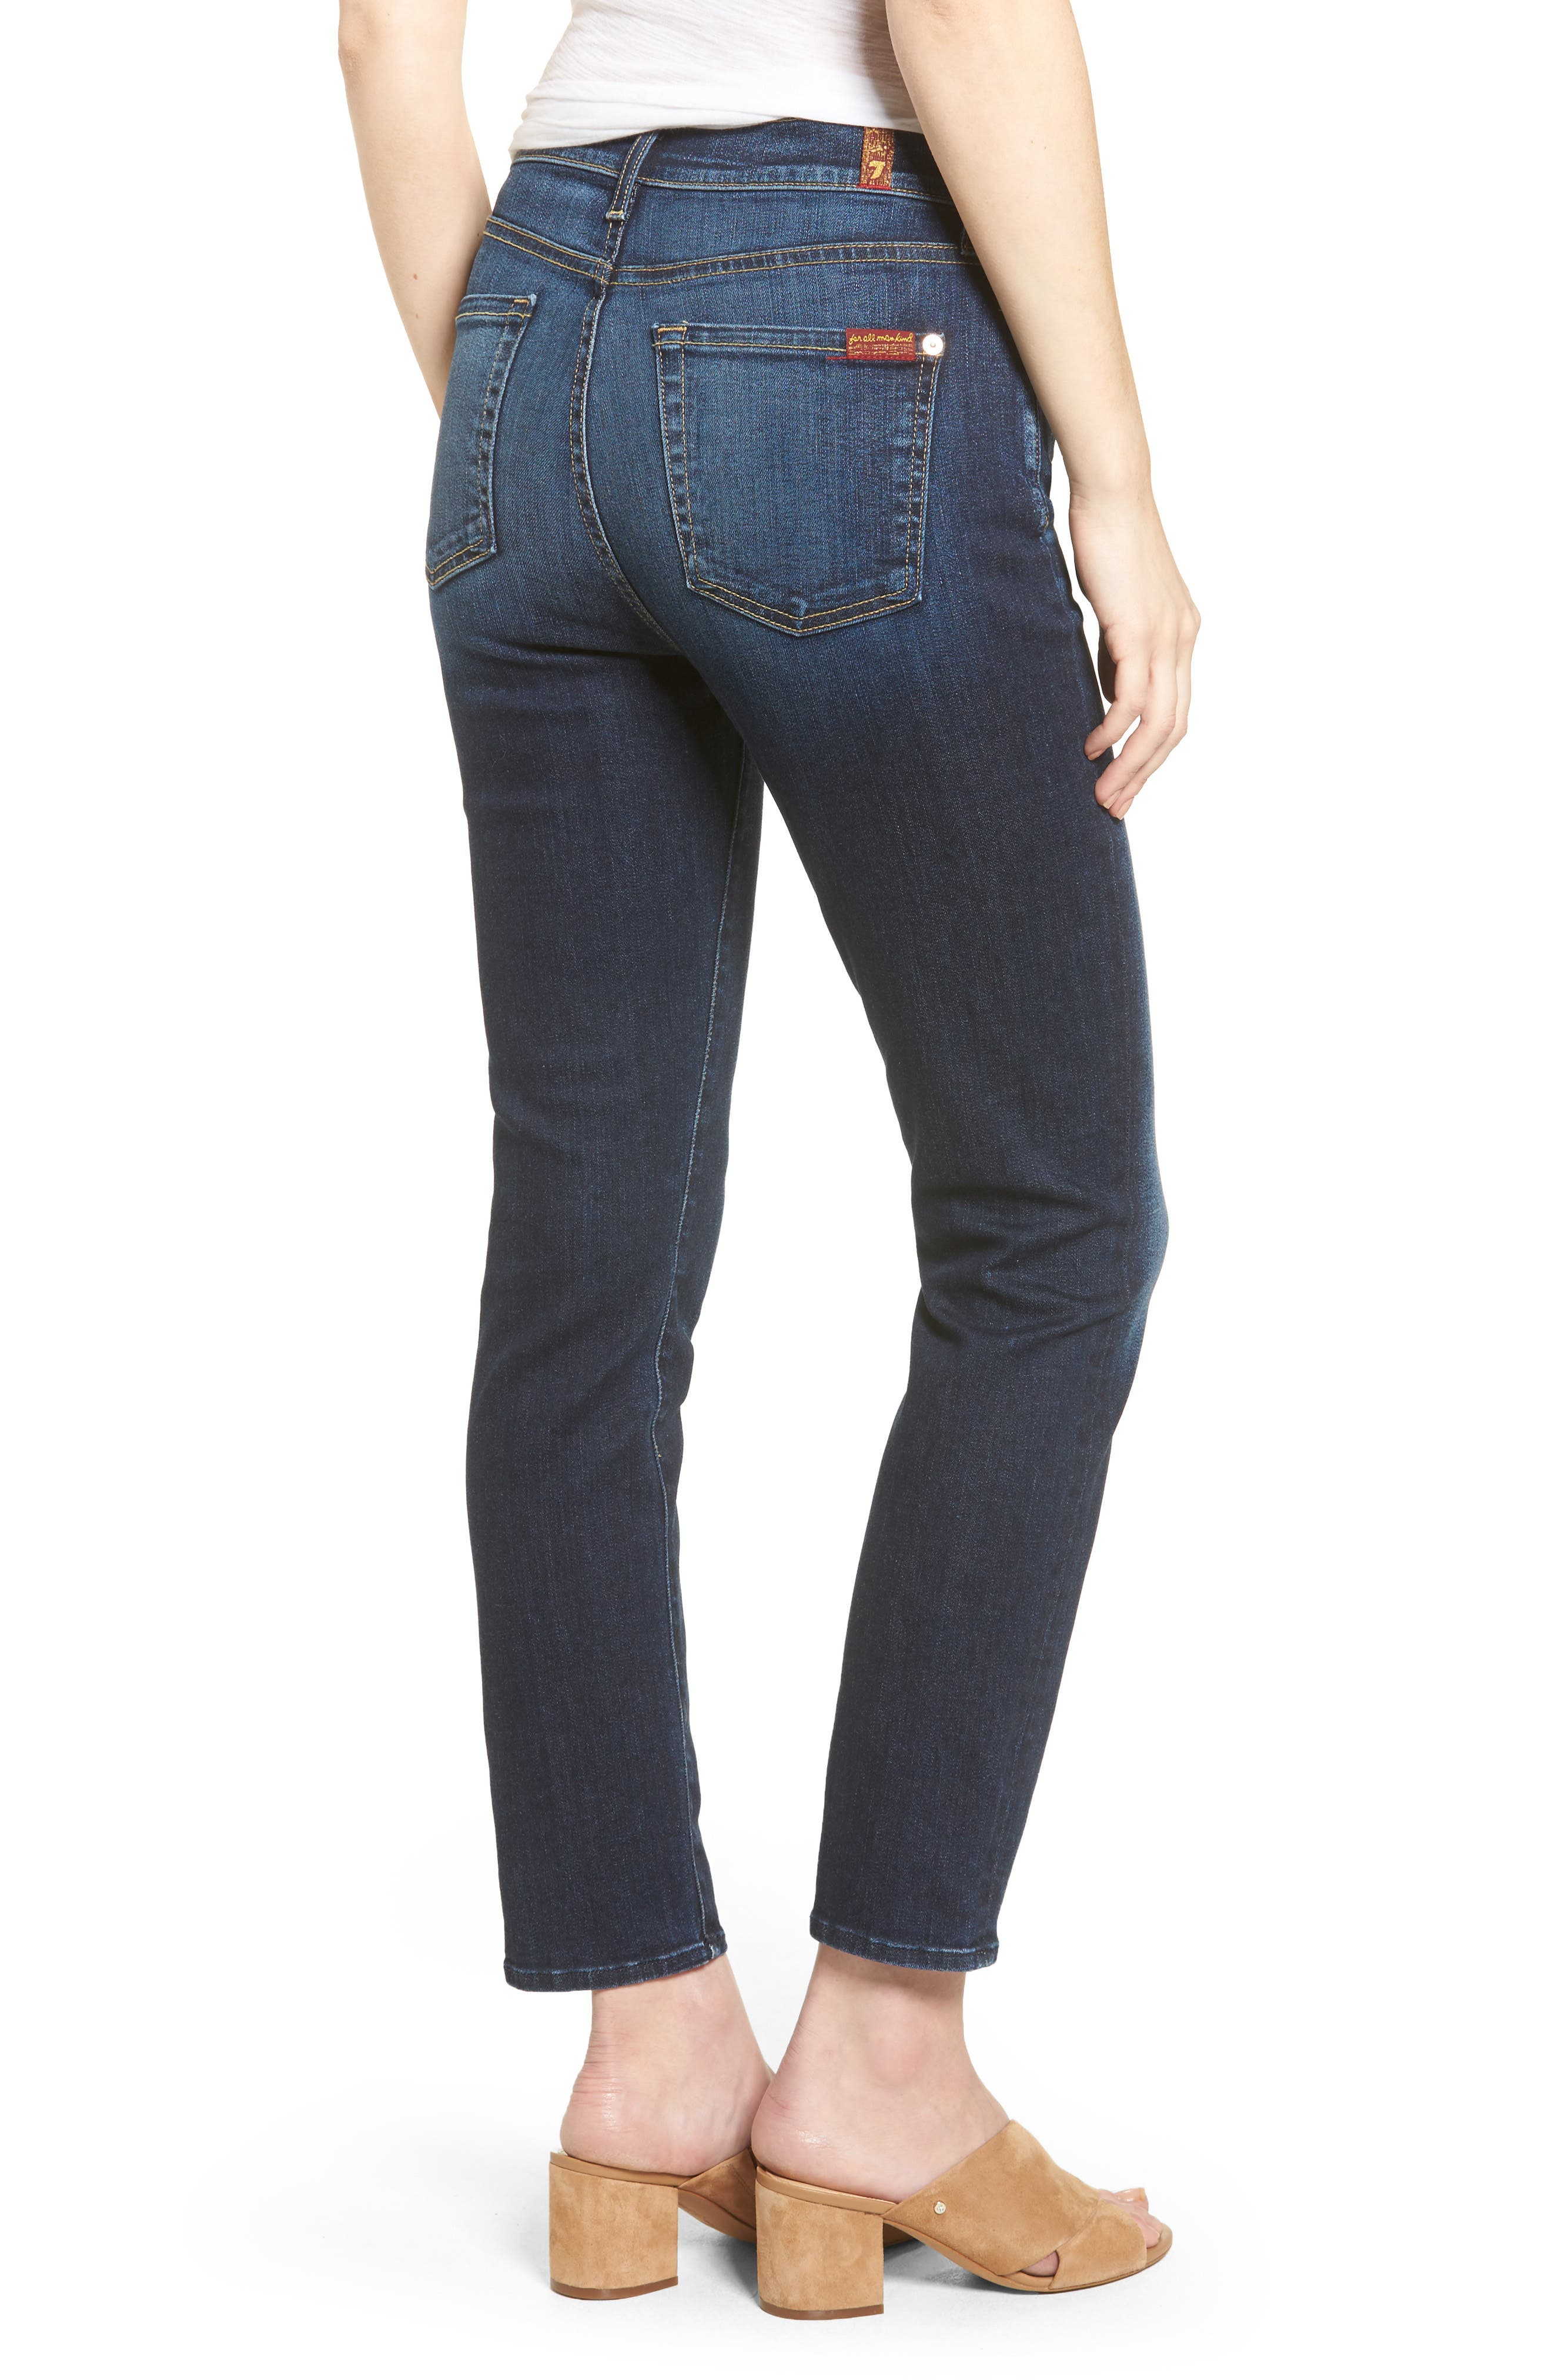 Seven7 Roxanne High Waist Ankle Jeans,                             Alternate thumbnail 2, color,                             401